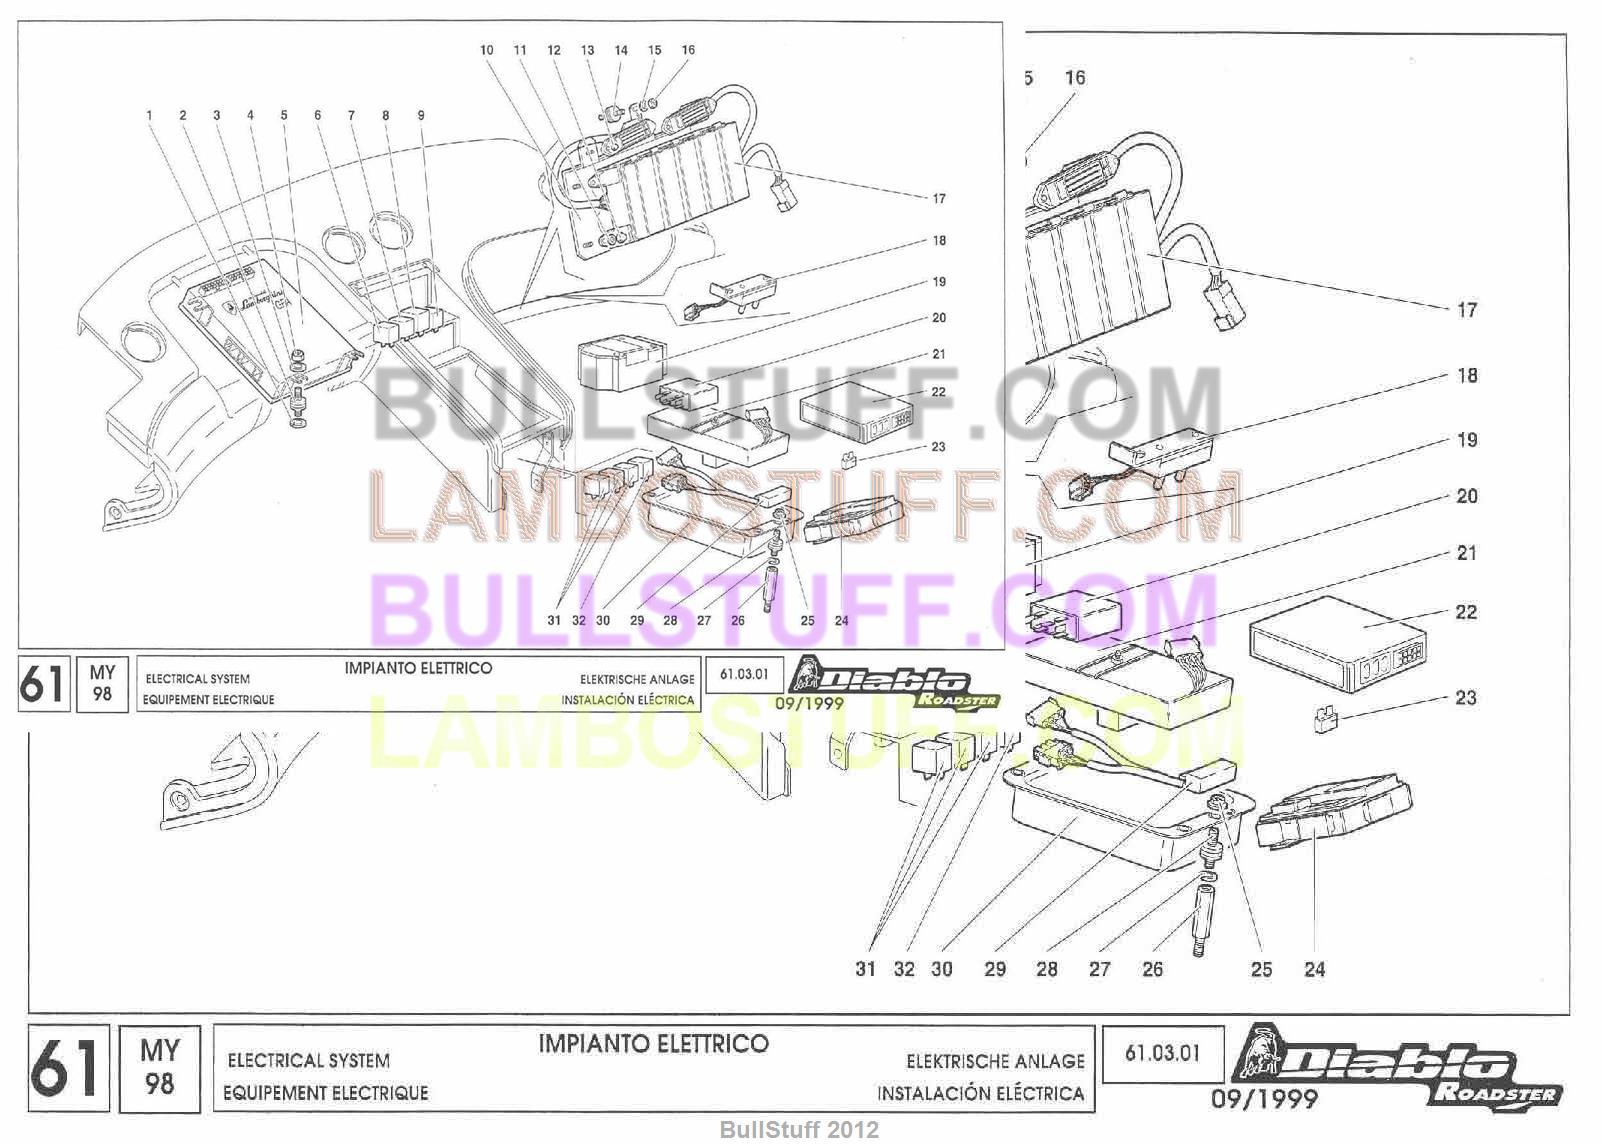 1998 lamborghini diablo roadster usa electrical system 61 03 01 rh bullstuff com